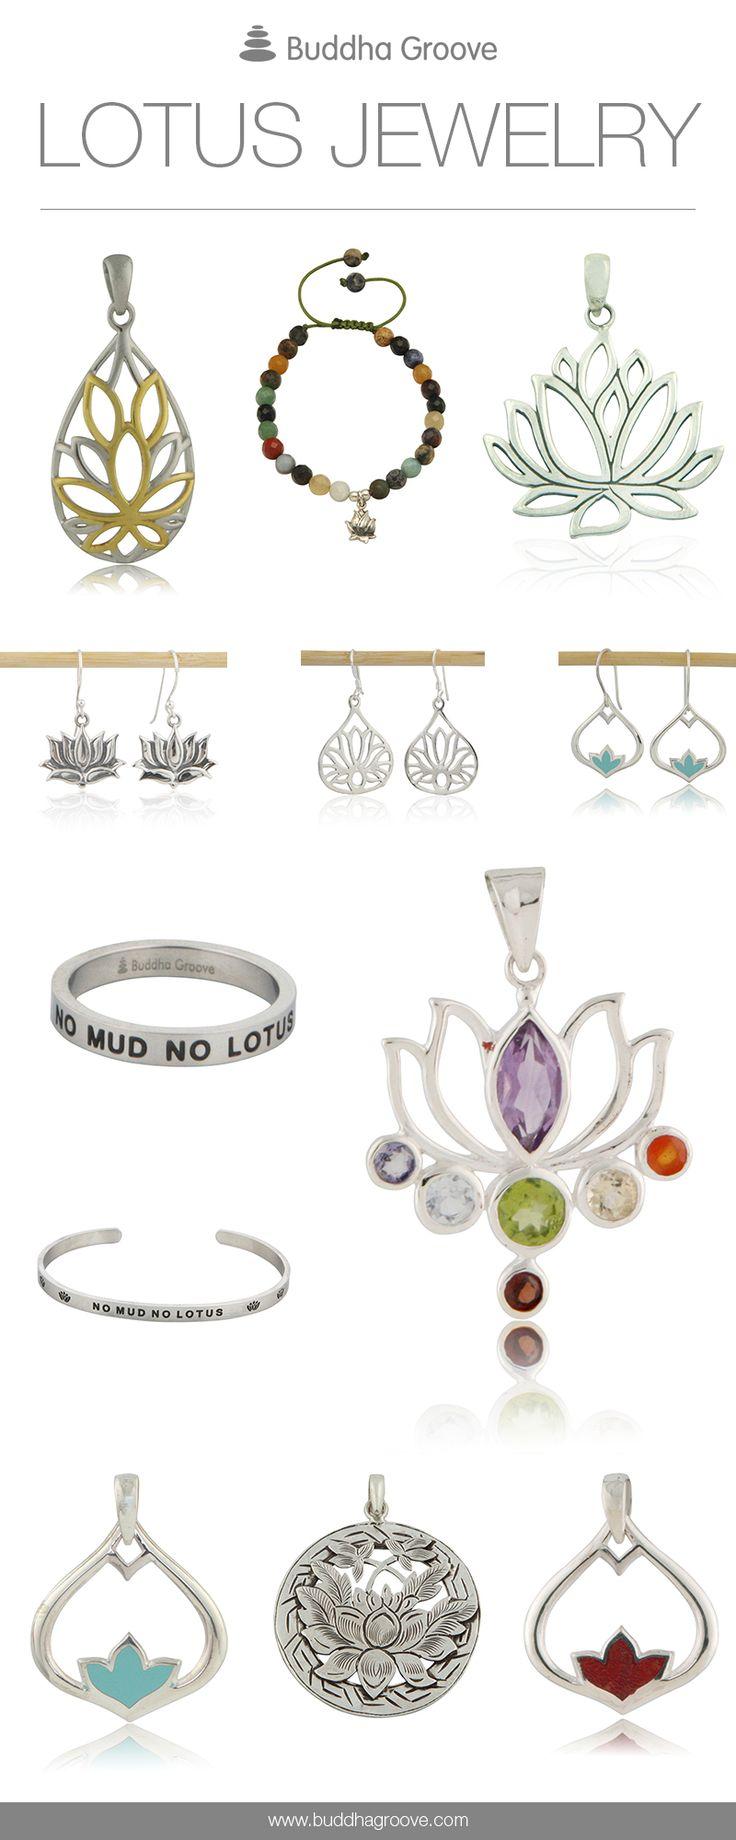 Artistic Lotus Jewelry Designs